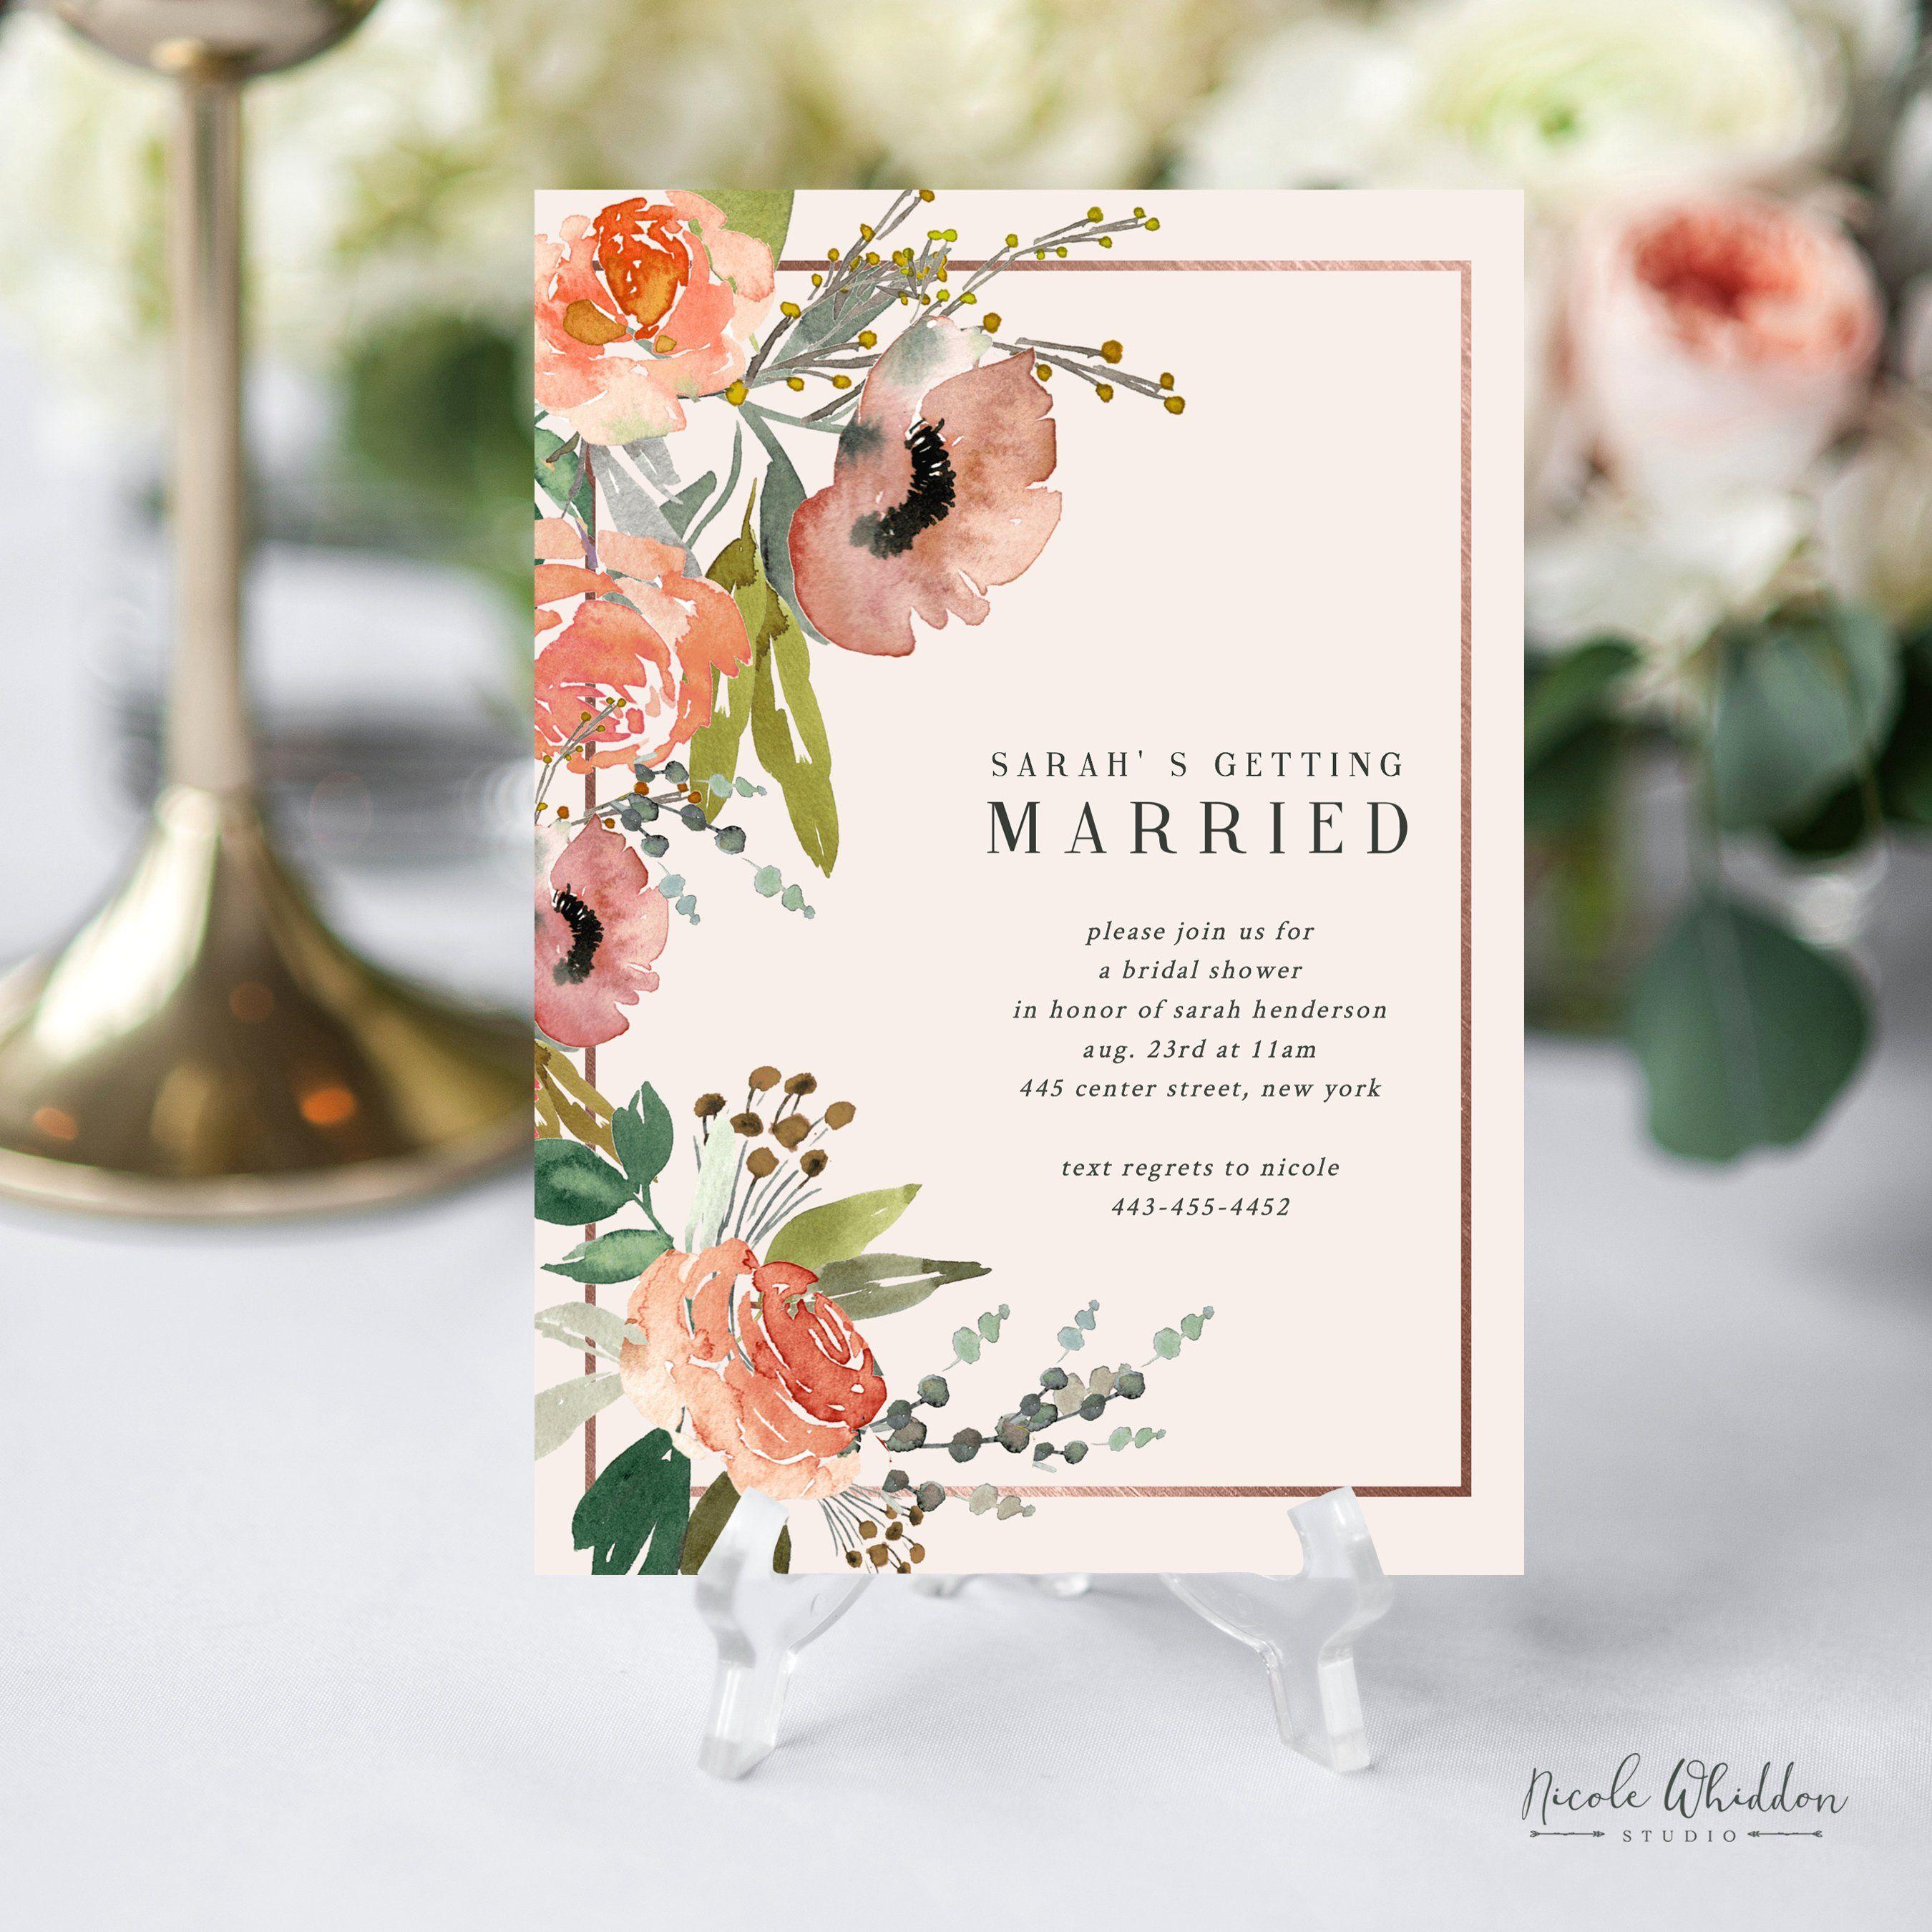 Editable Bridal Shower Invitations Template